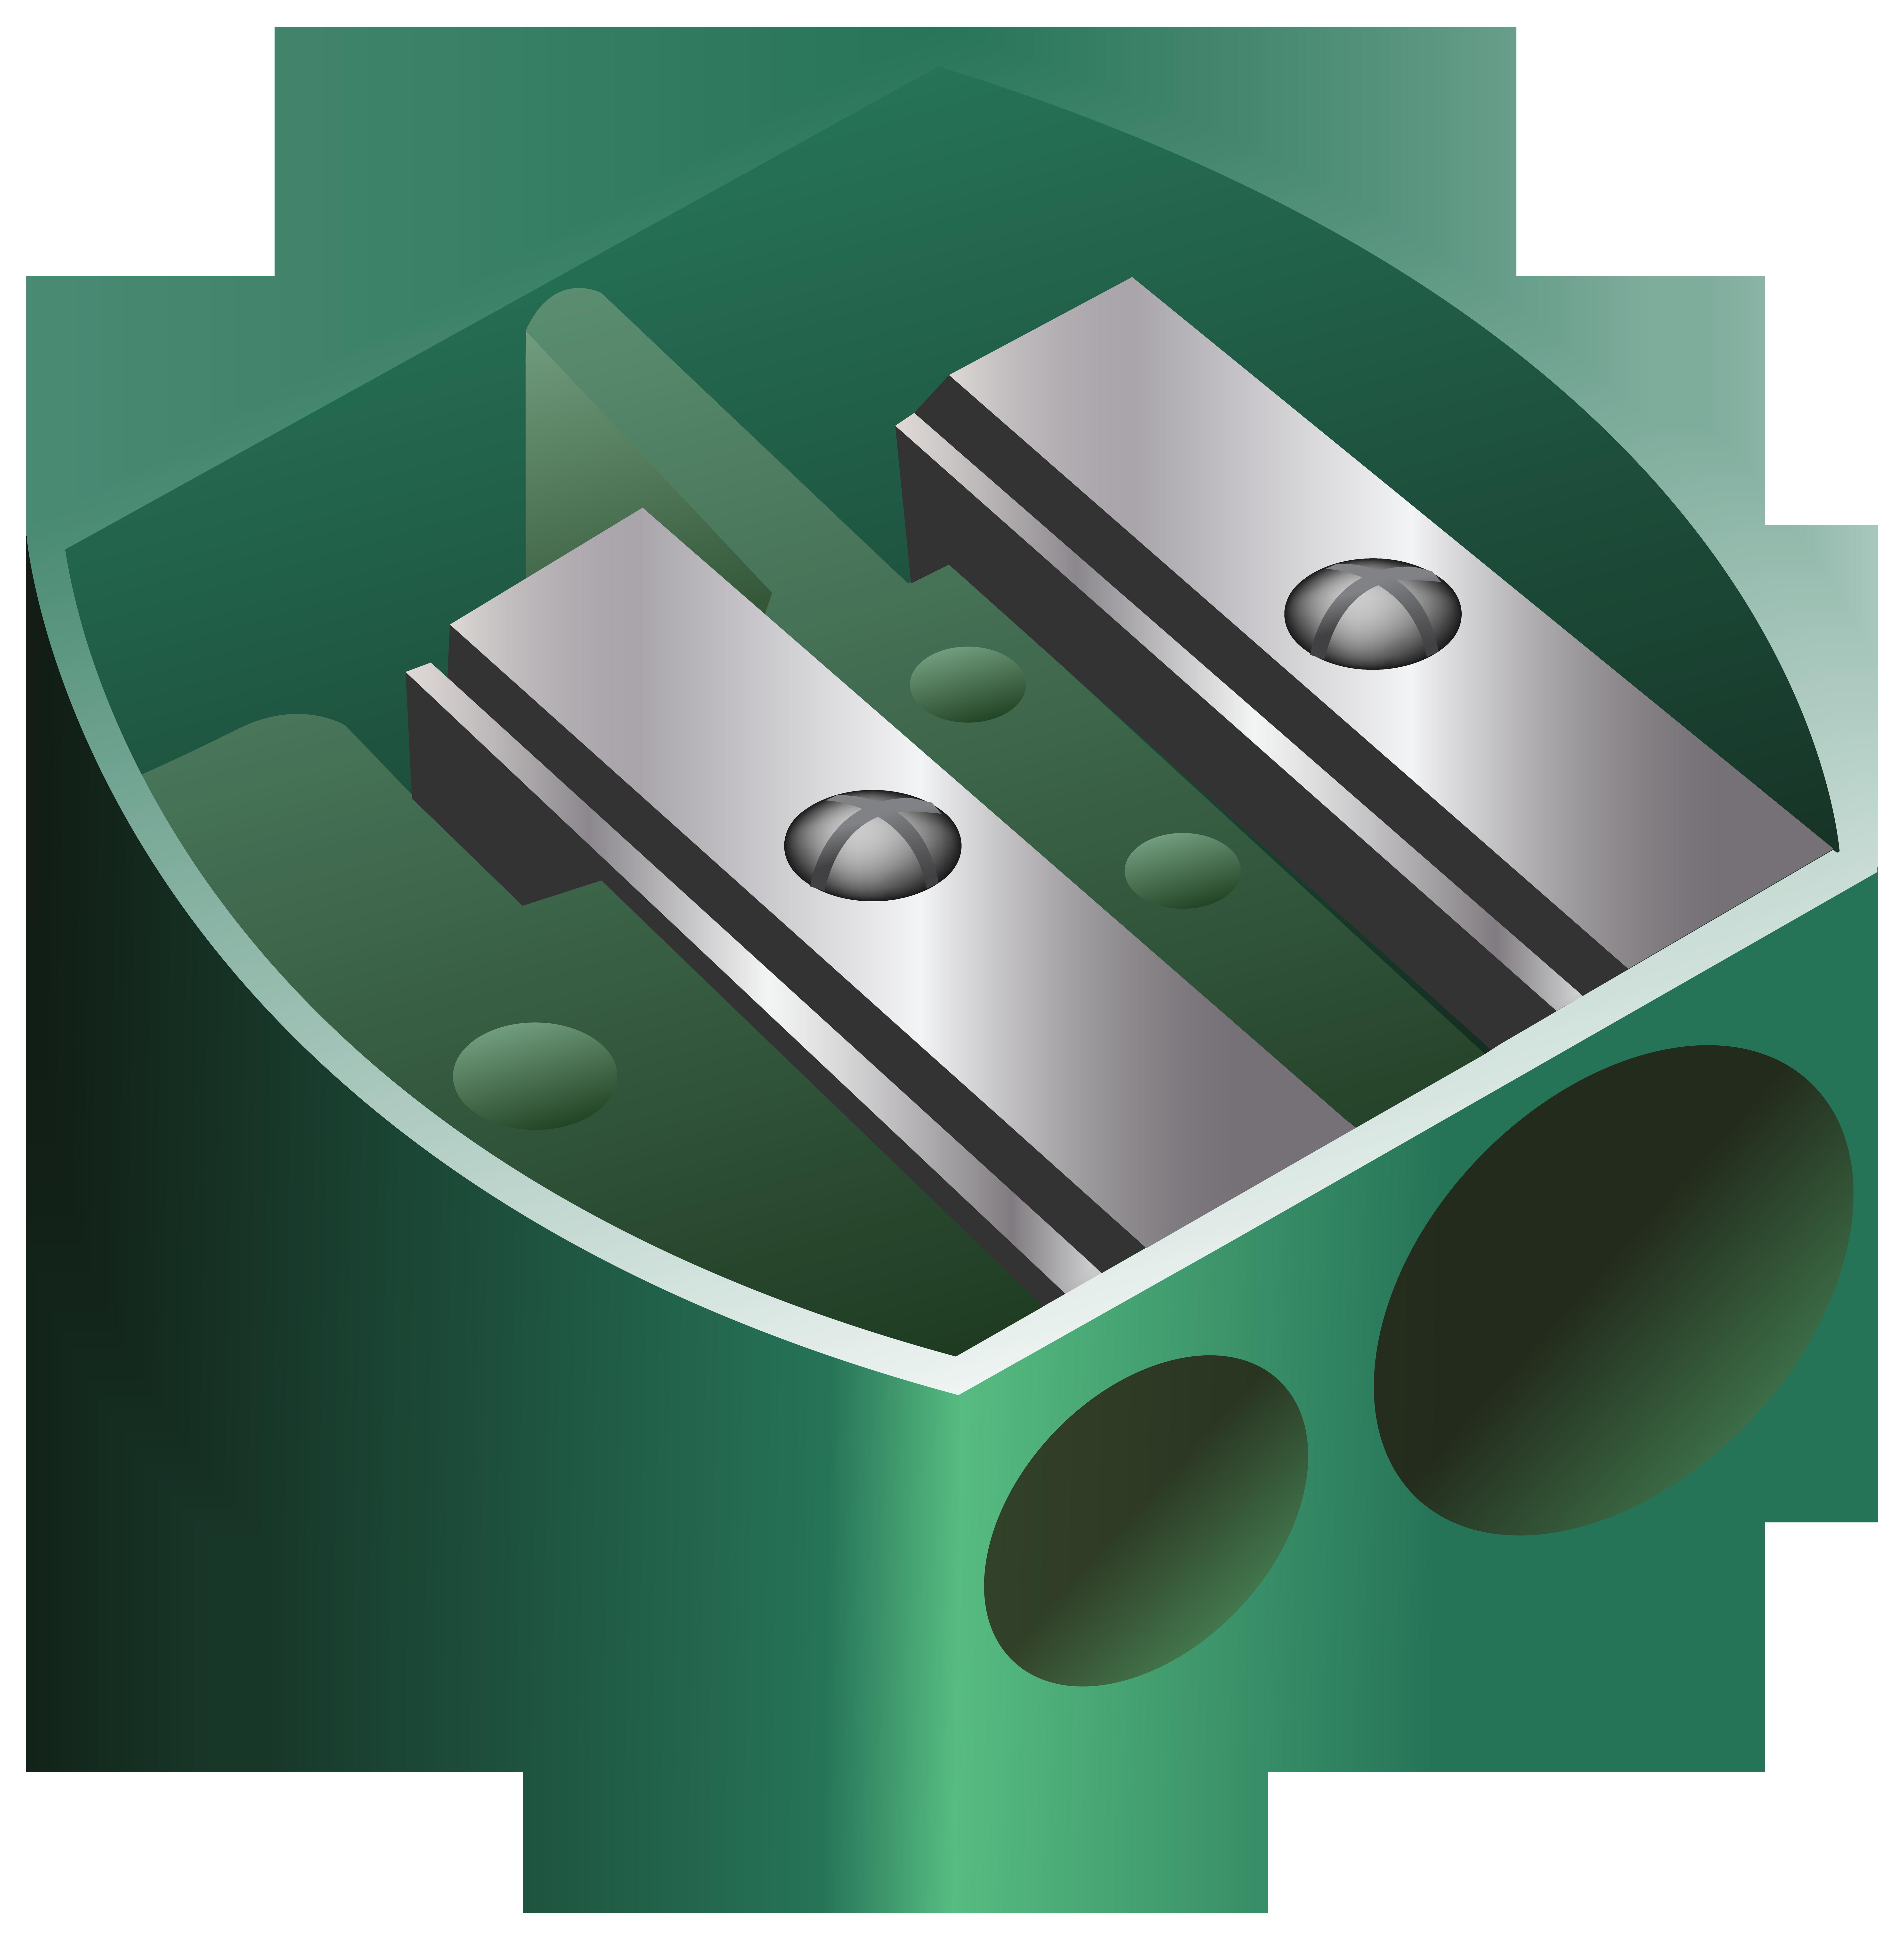 Sharpener png transparent clip. Name clipart pencil